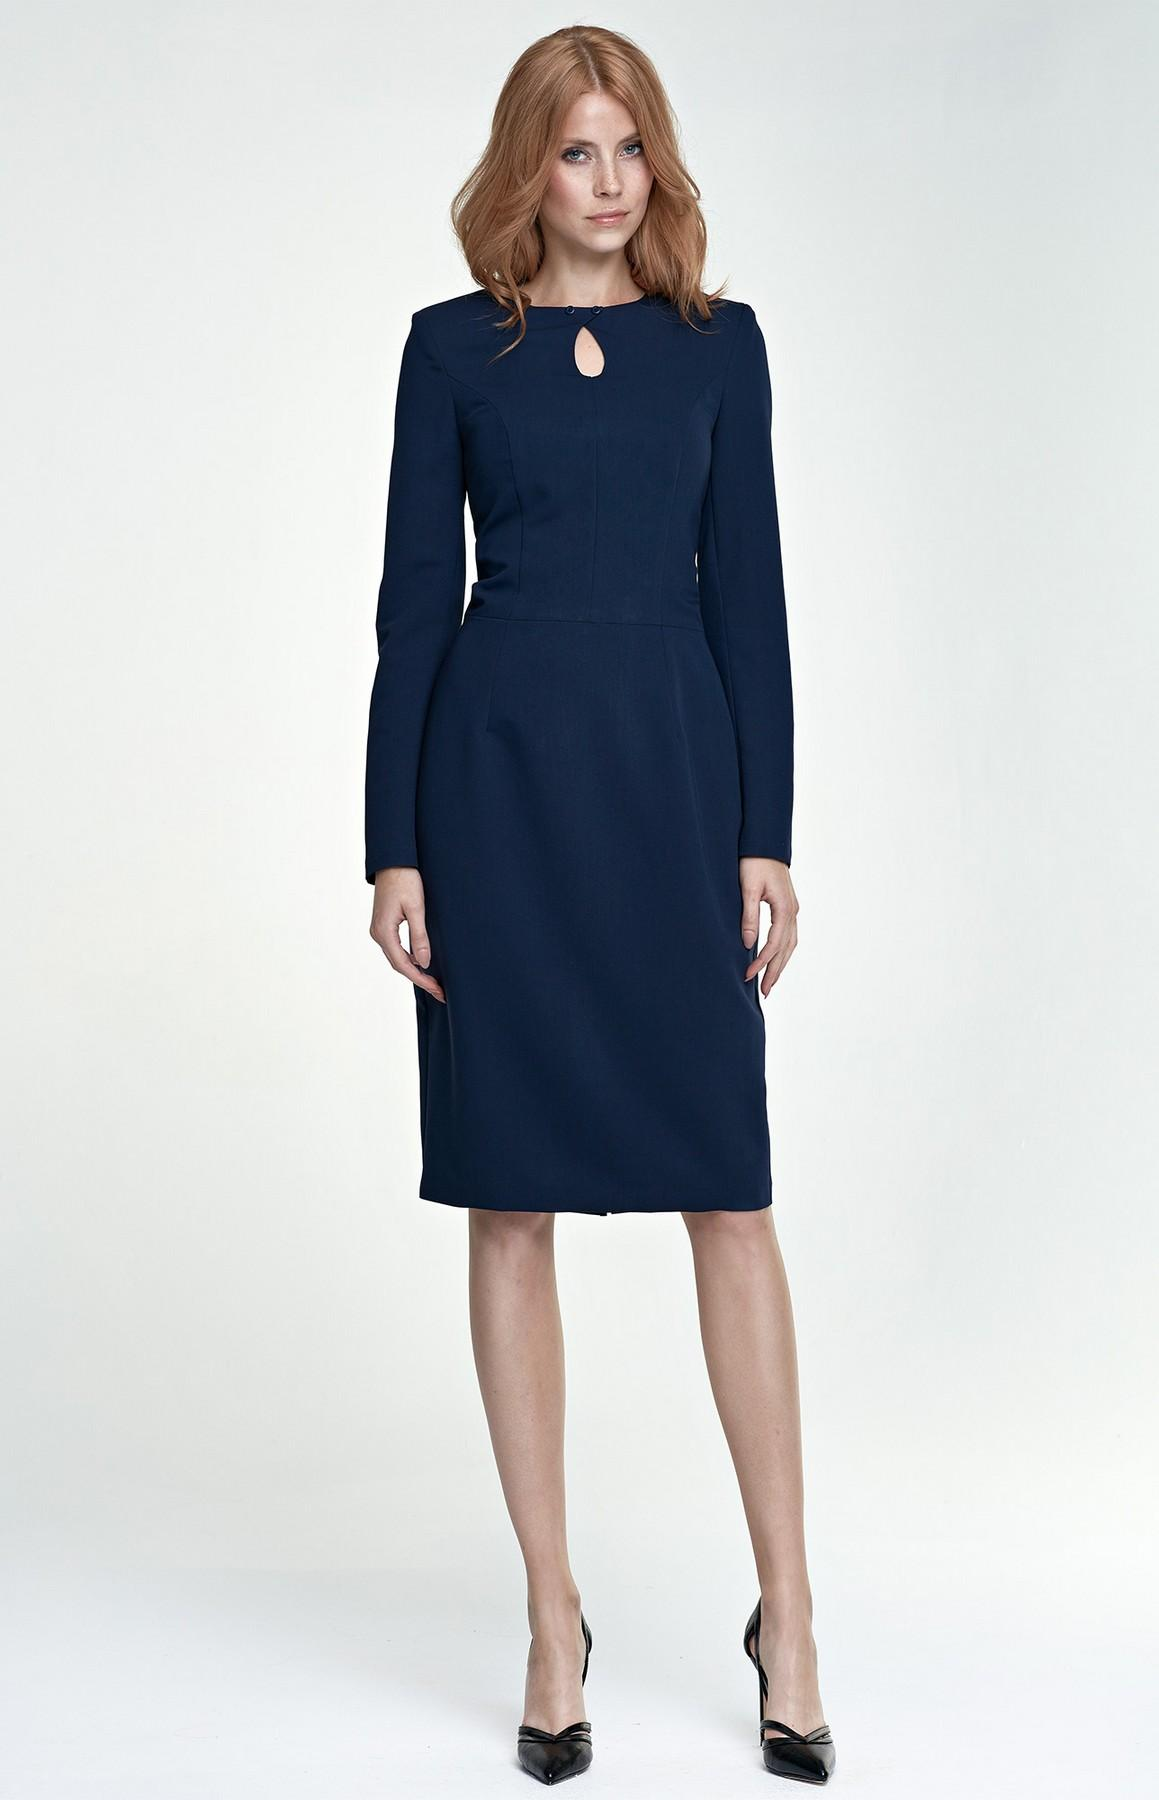 Robe bleu marine manche longue